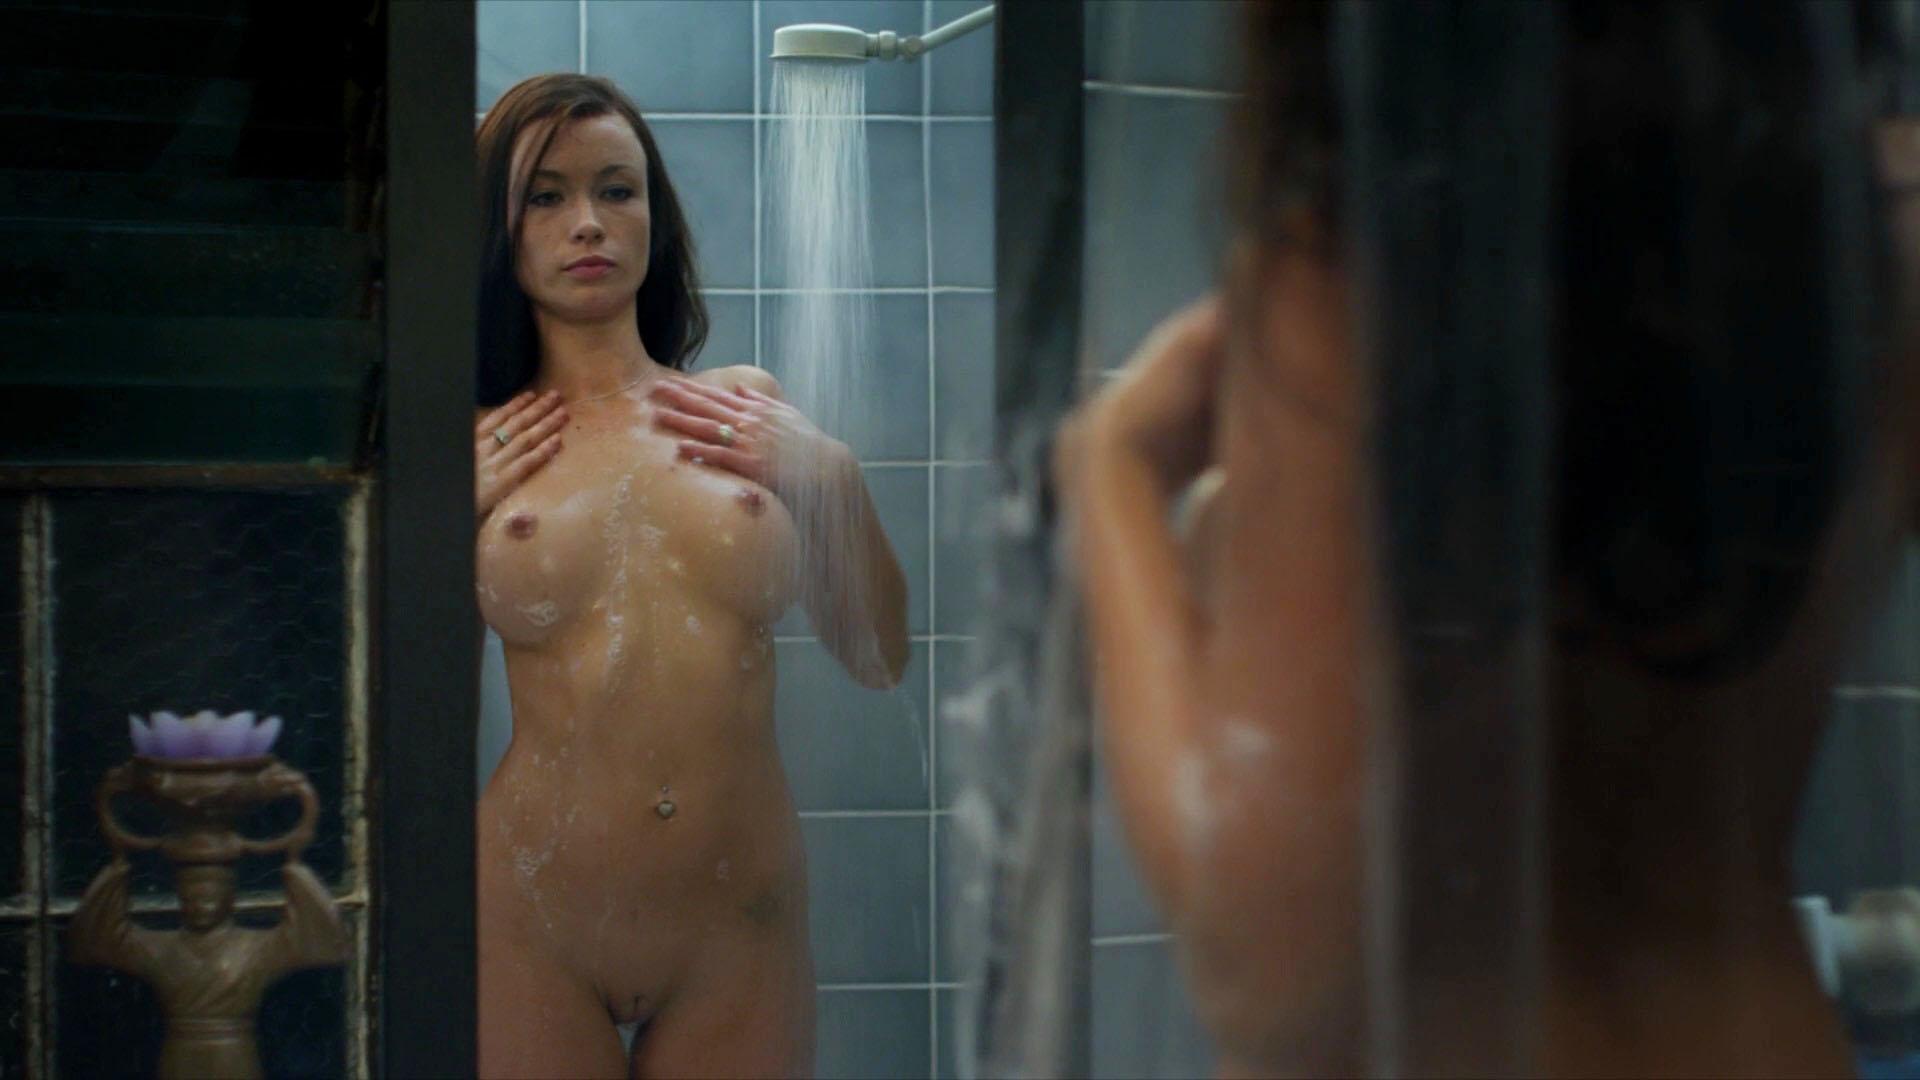 Viva bianca naked pics